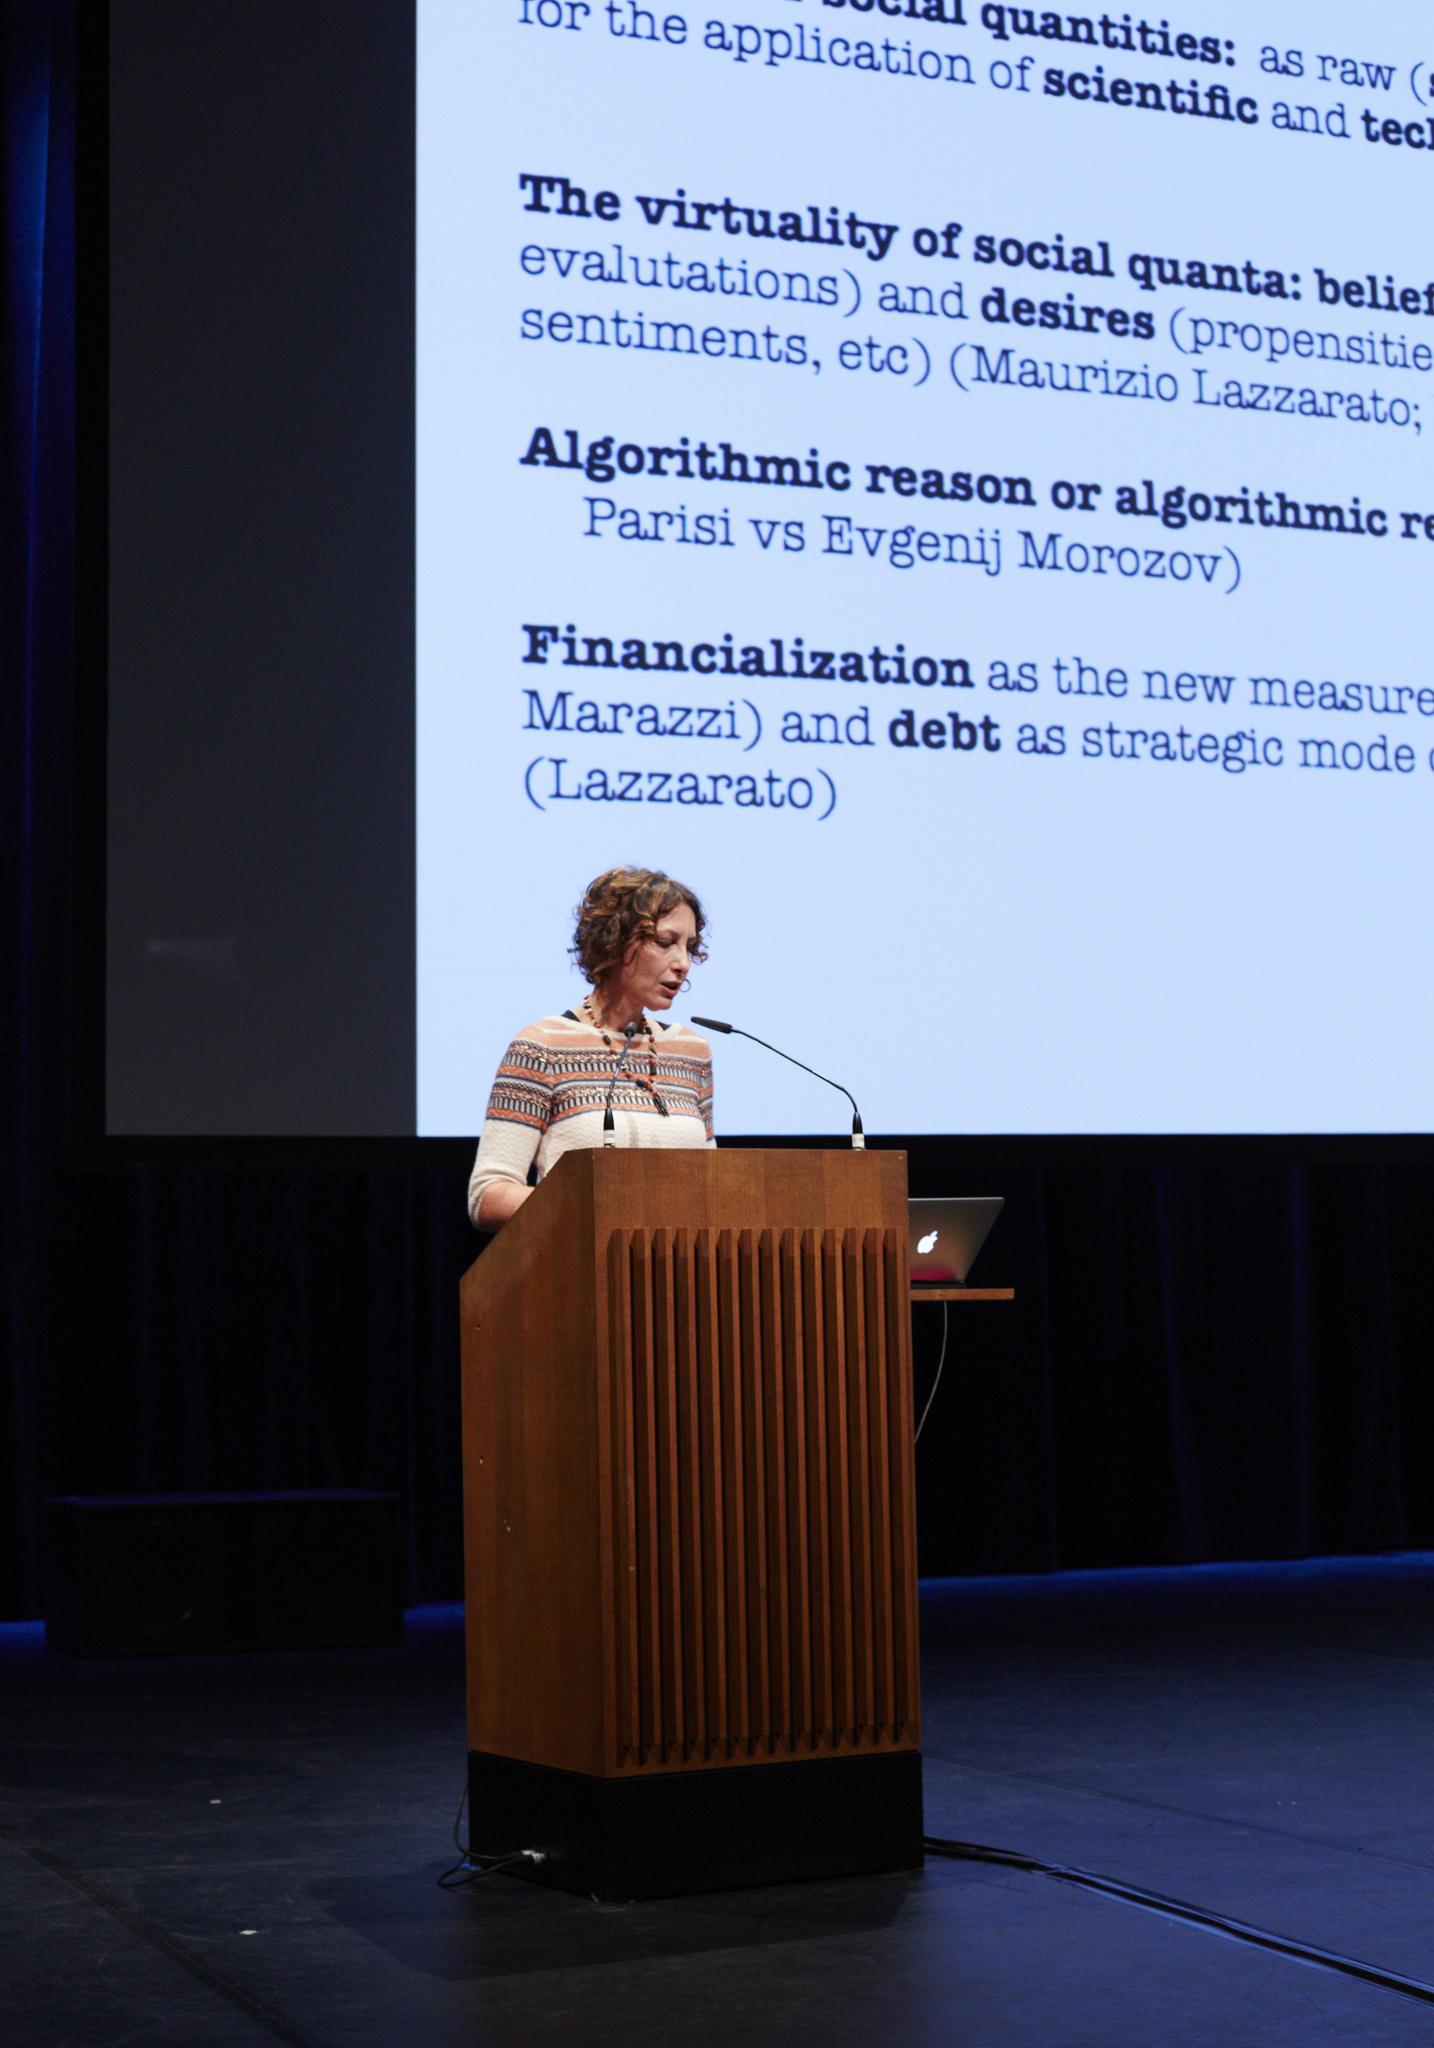 Tiziana Terranova delivering her talk onthe commons